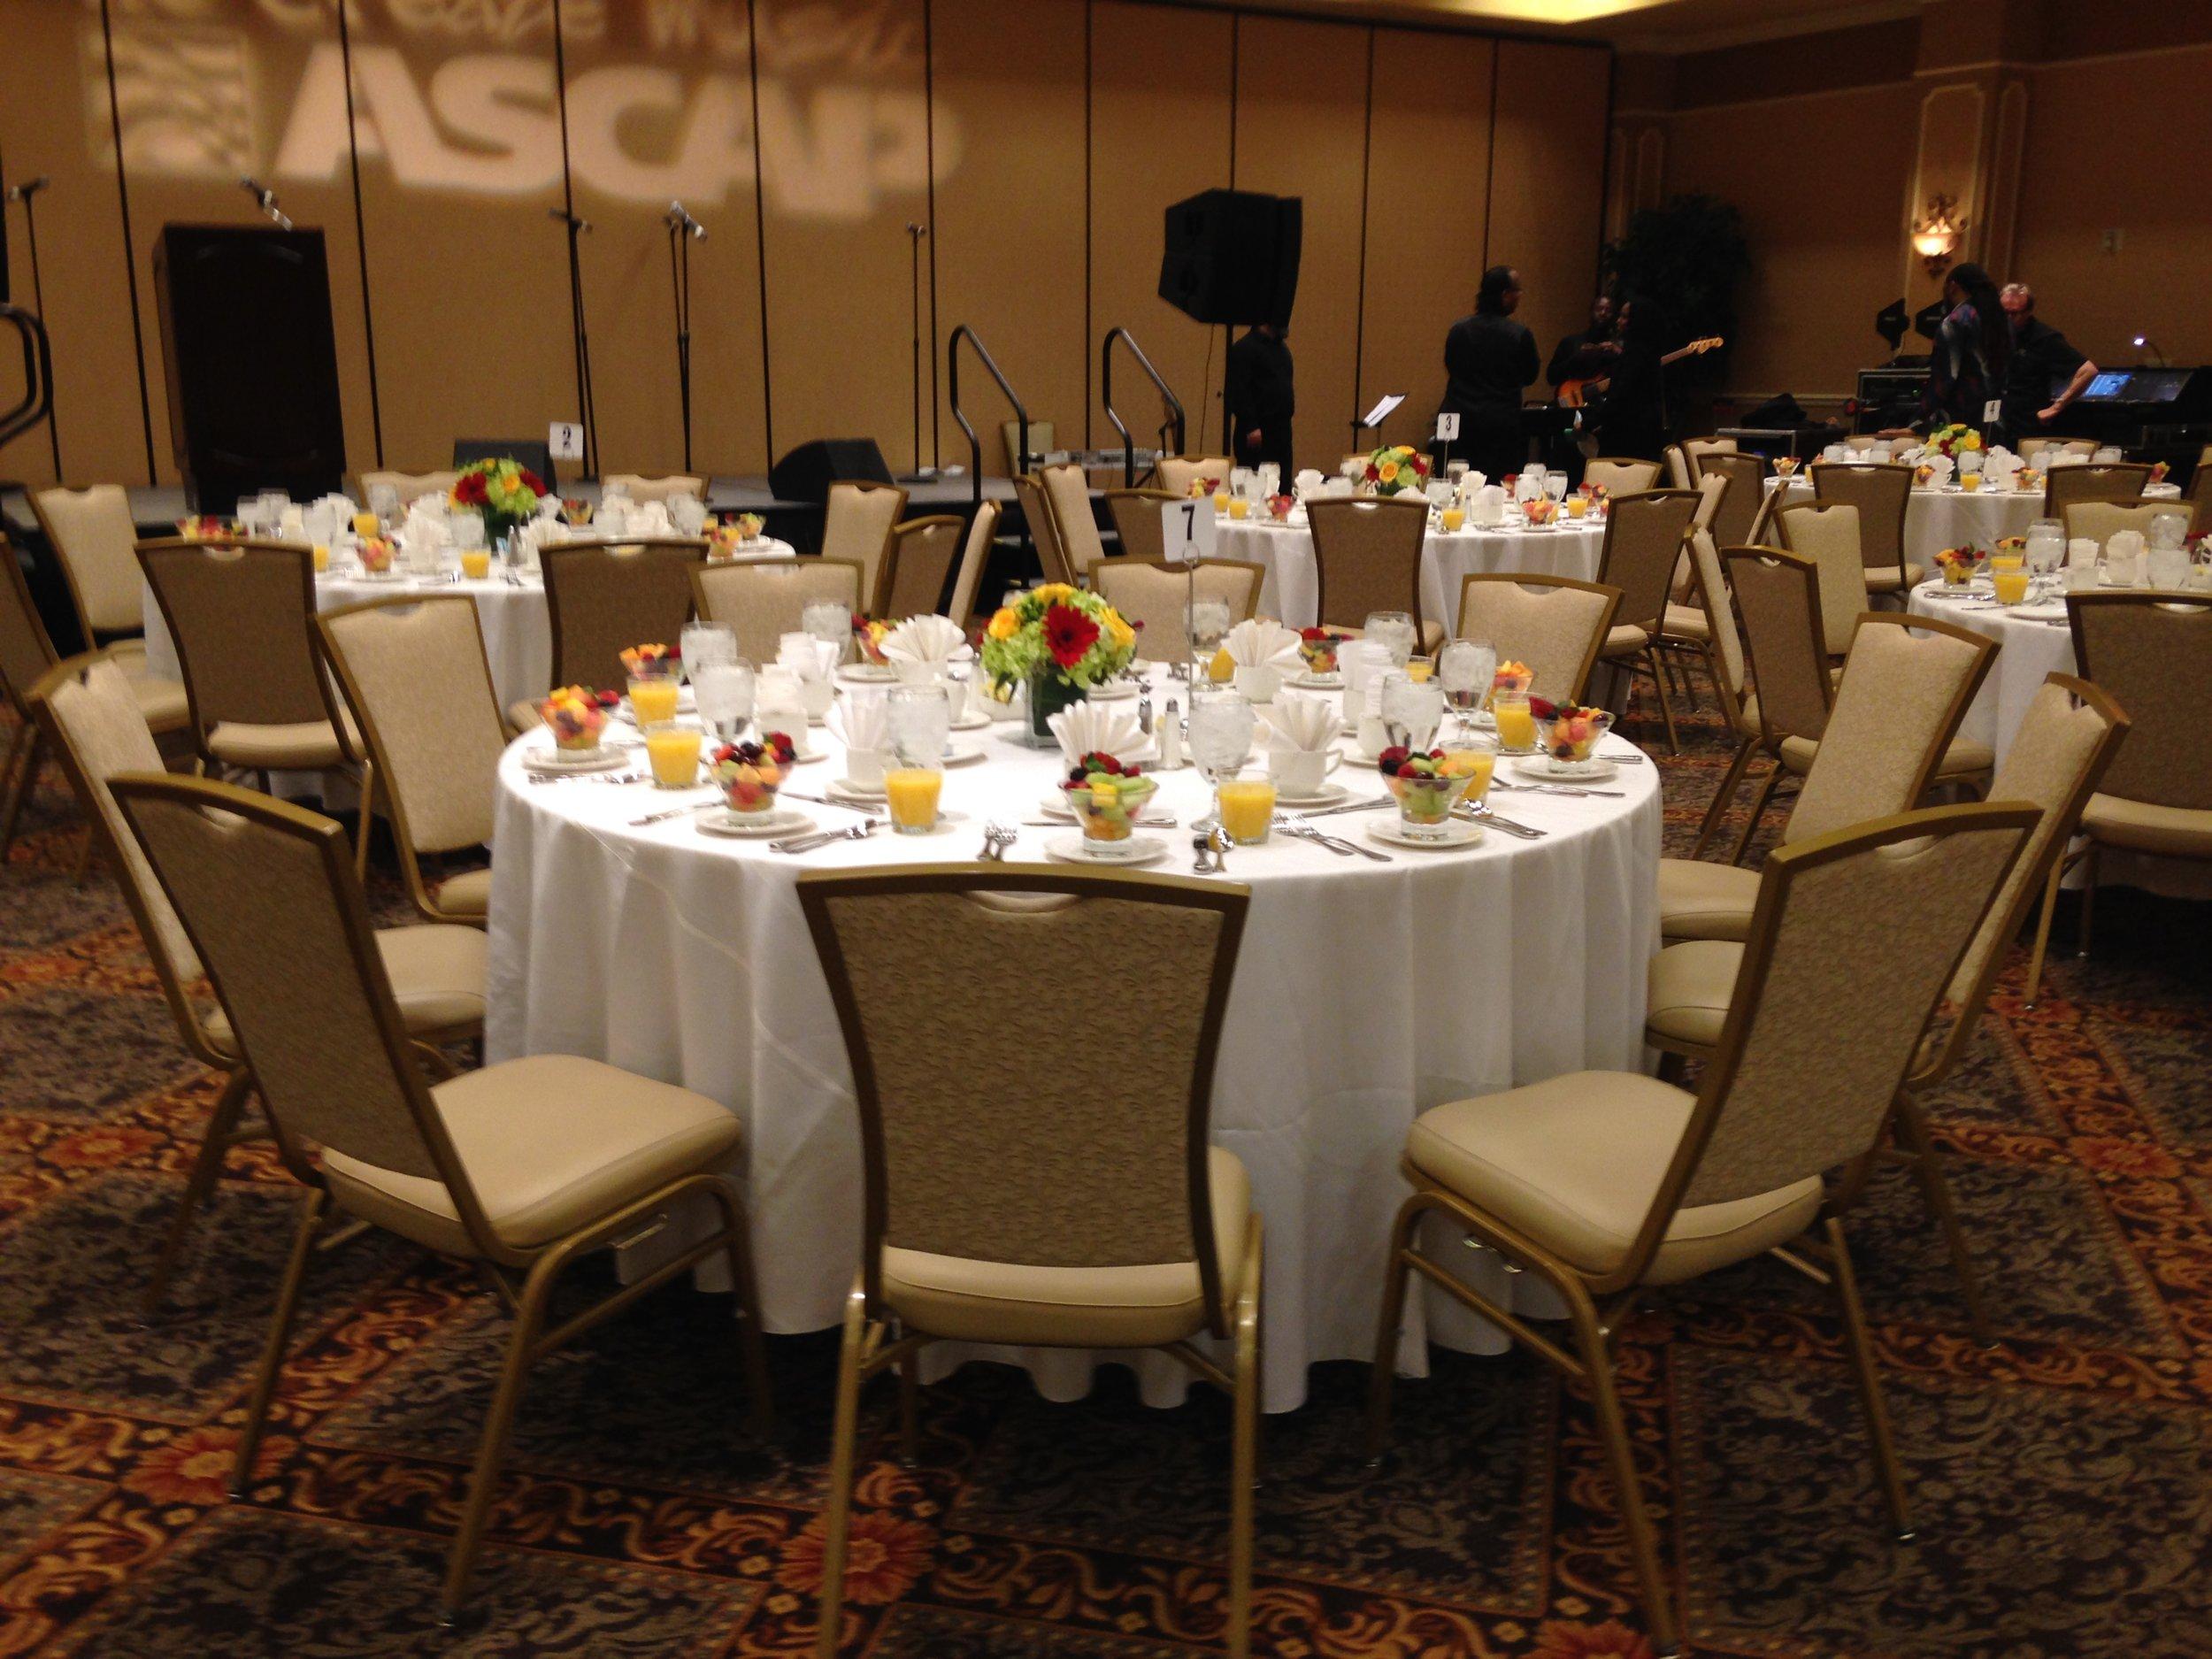 ASCAP Awards Banquet